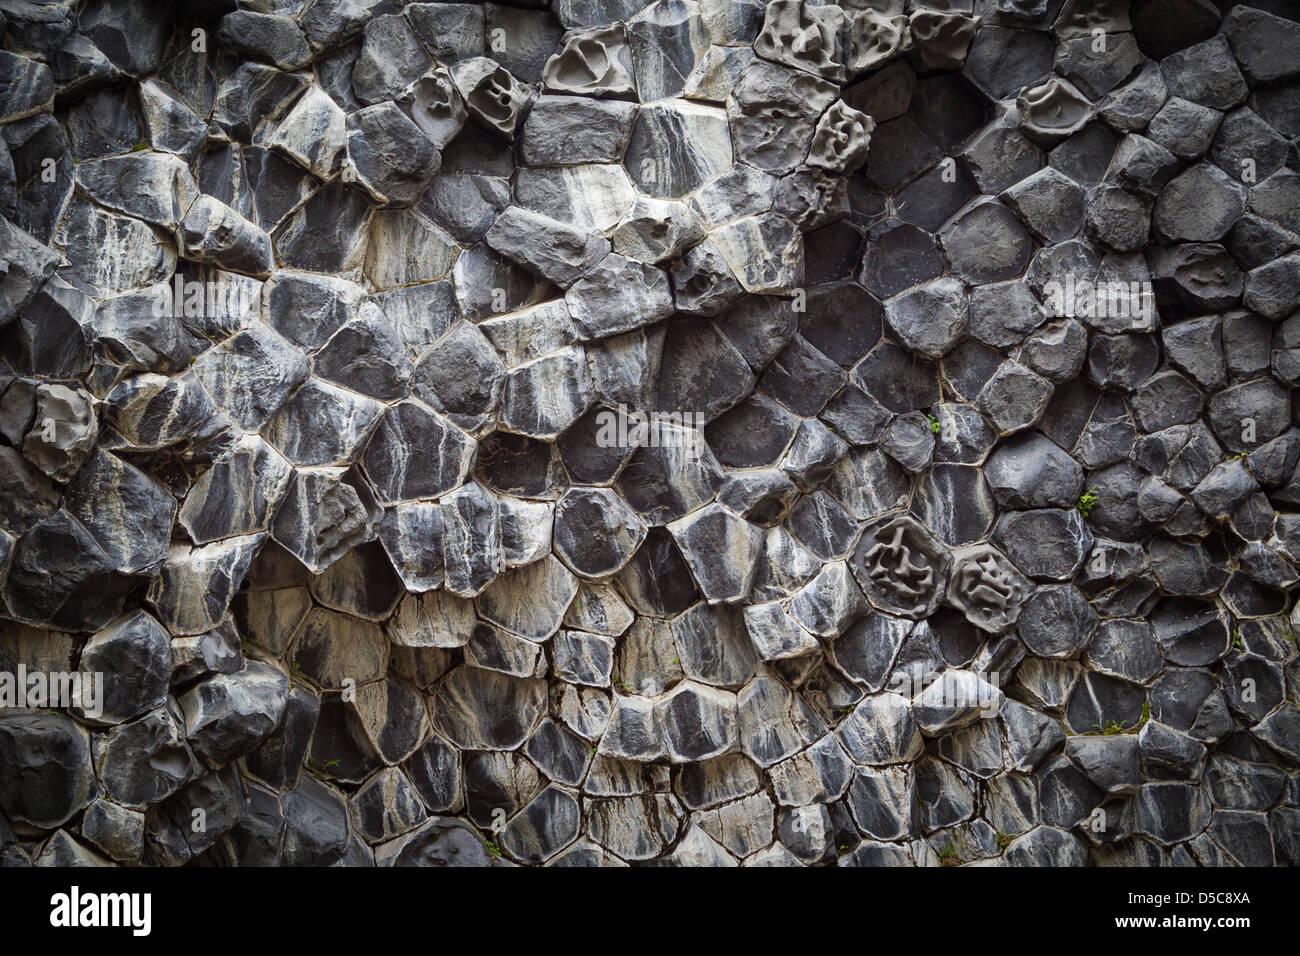 Hexagonal and pentagonal baslatic columns are the remains of old volcanic activity in Jokulsargljufur National Park - Stock Image